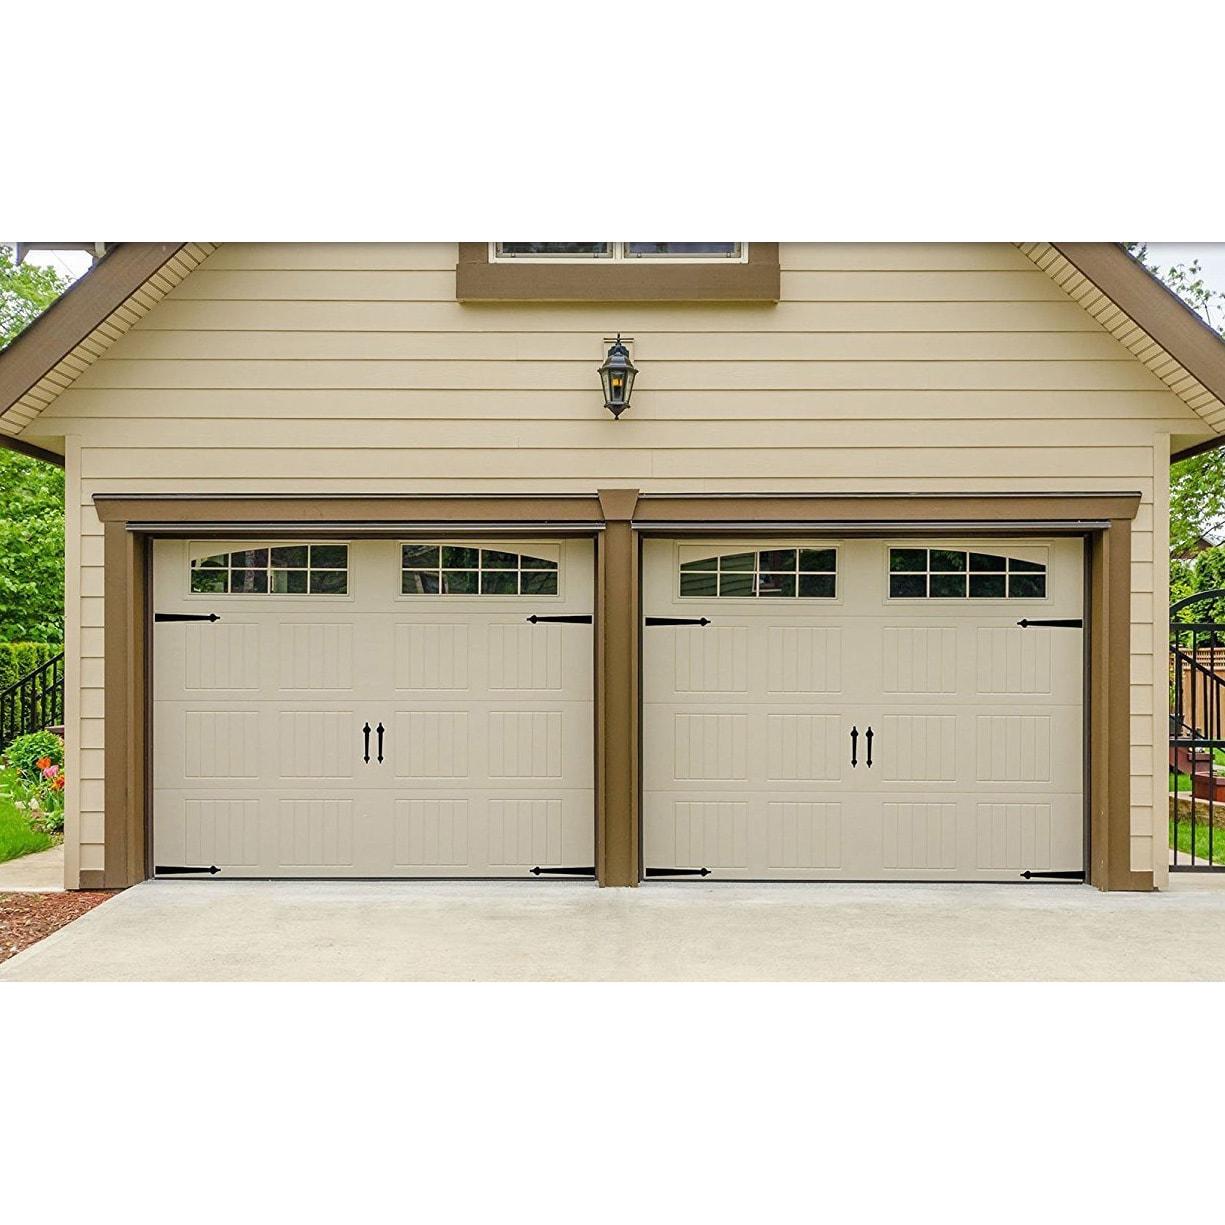 Garage Door Magnetic Accents Handle Hinge Carriage House Hardware Decorative Kit